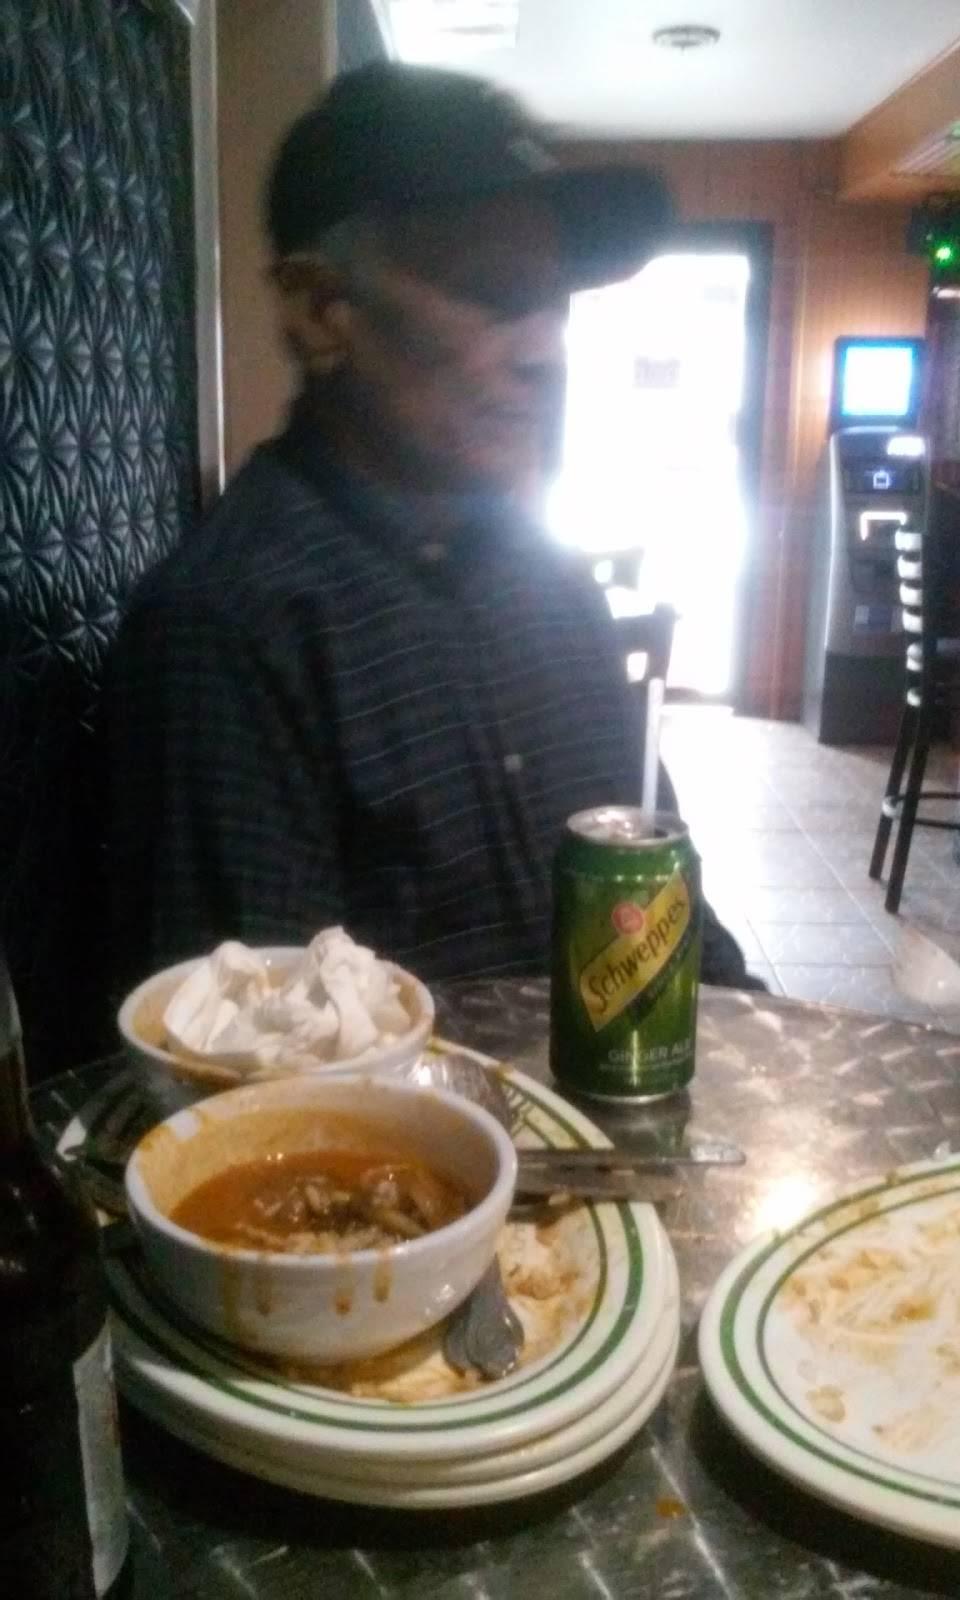 La Rola | restaurant | 400 E 198th St, Bronx, NY 10458, USA | 9176881448 OR +1 917-688-1448